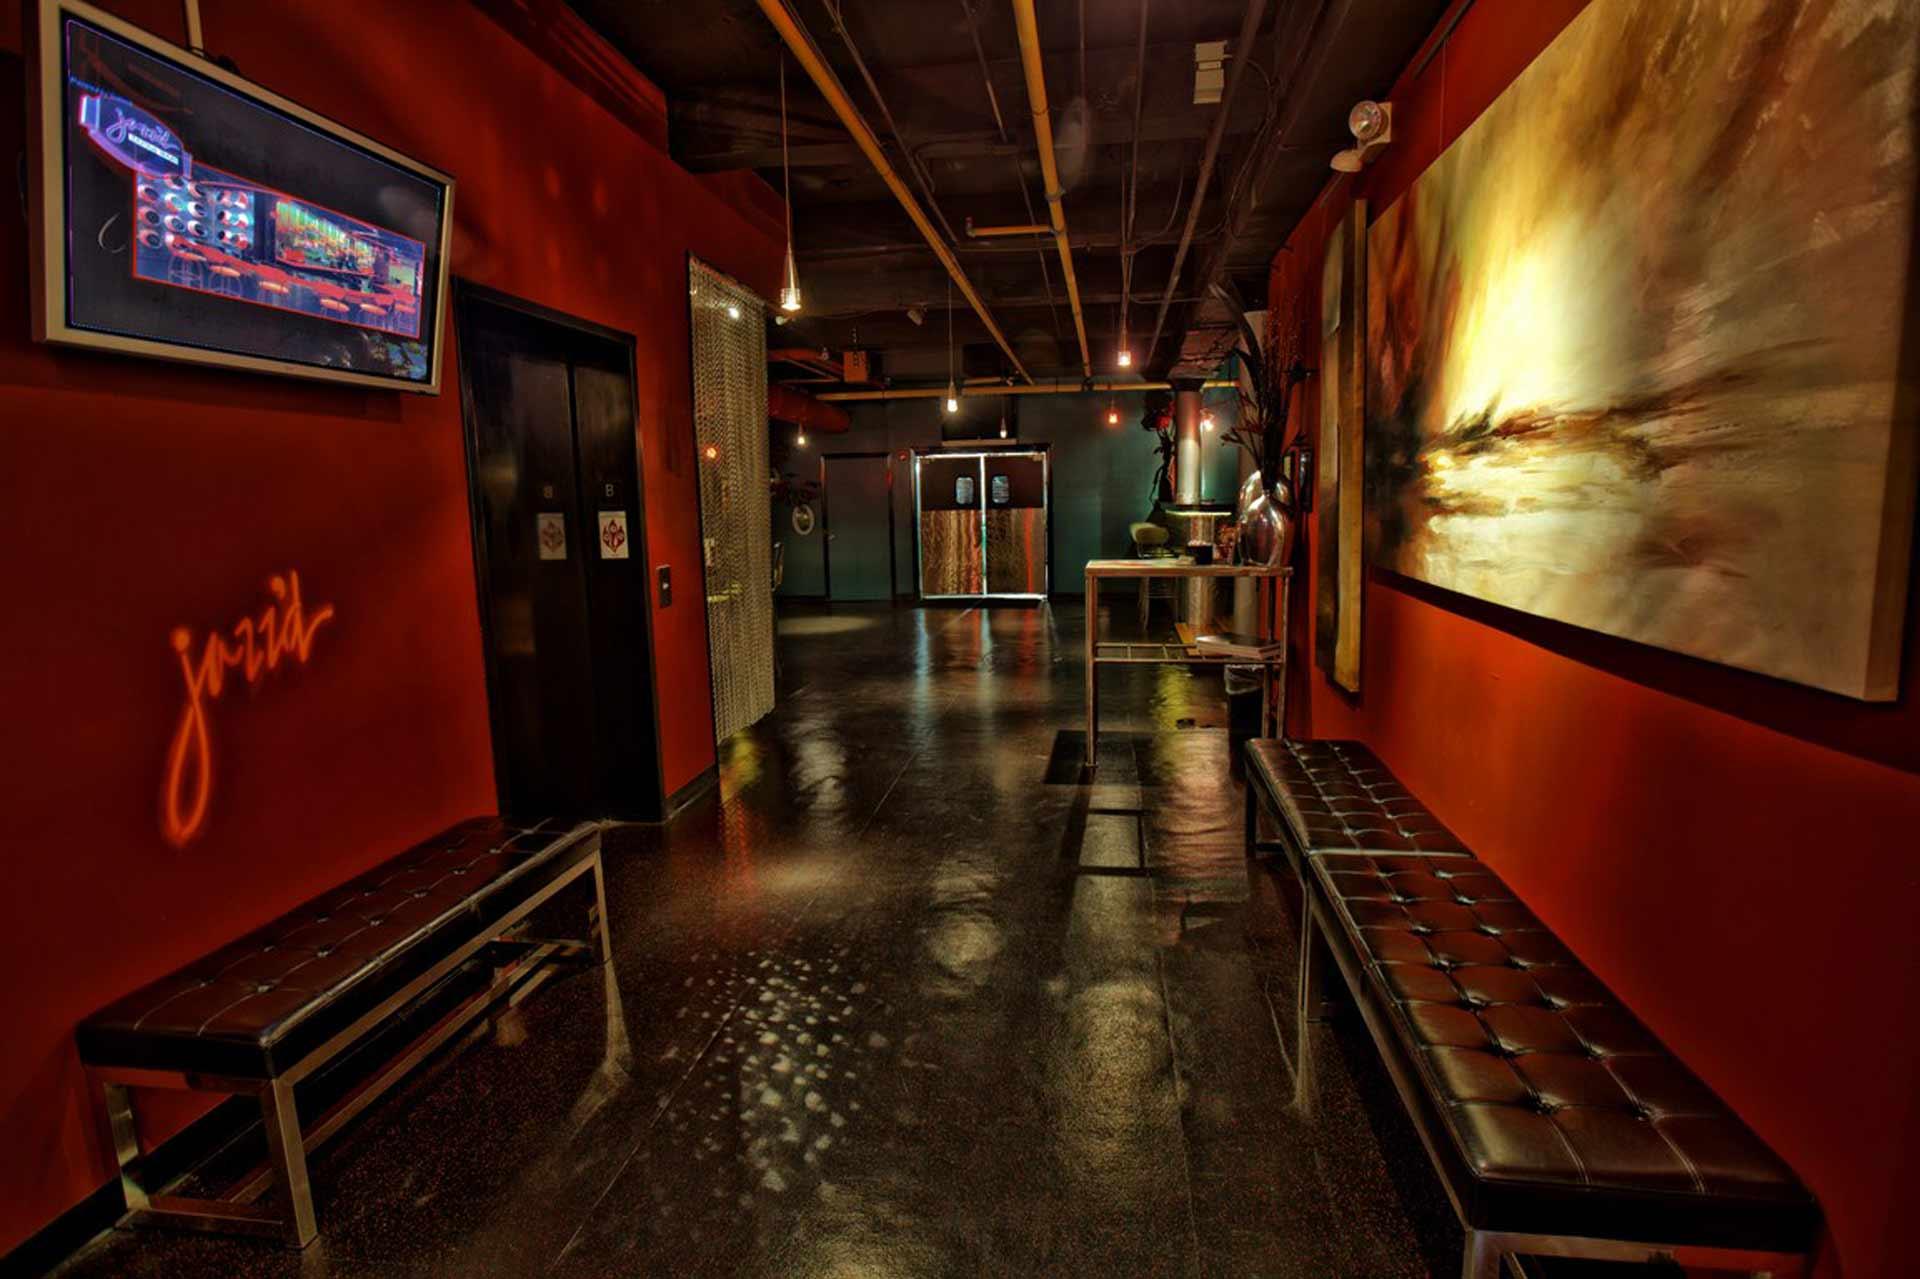 Jazzd Tapas Bar and Restaurant Jazzd Tapas Bar